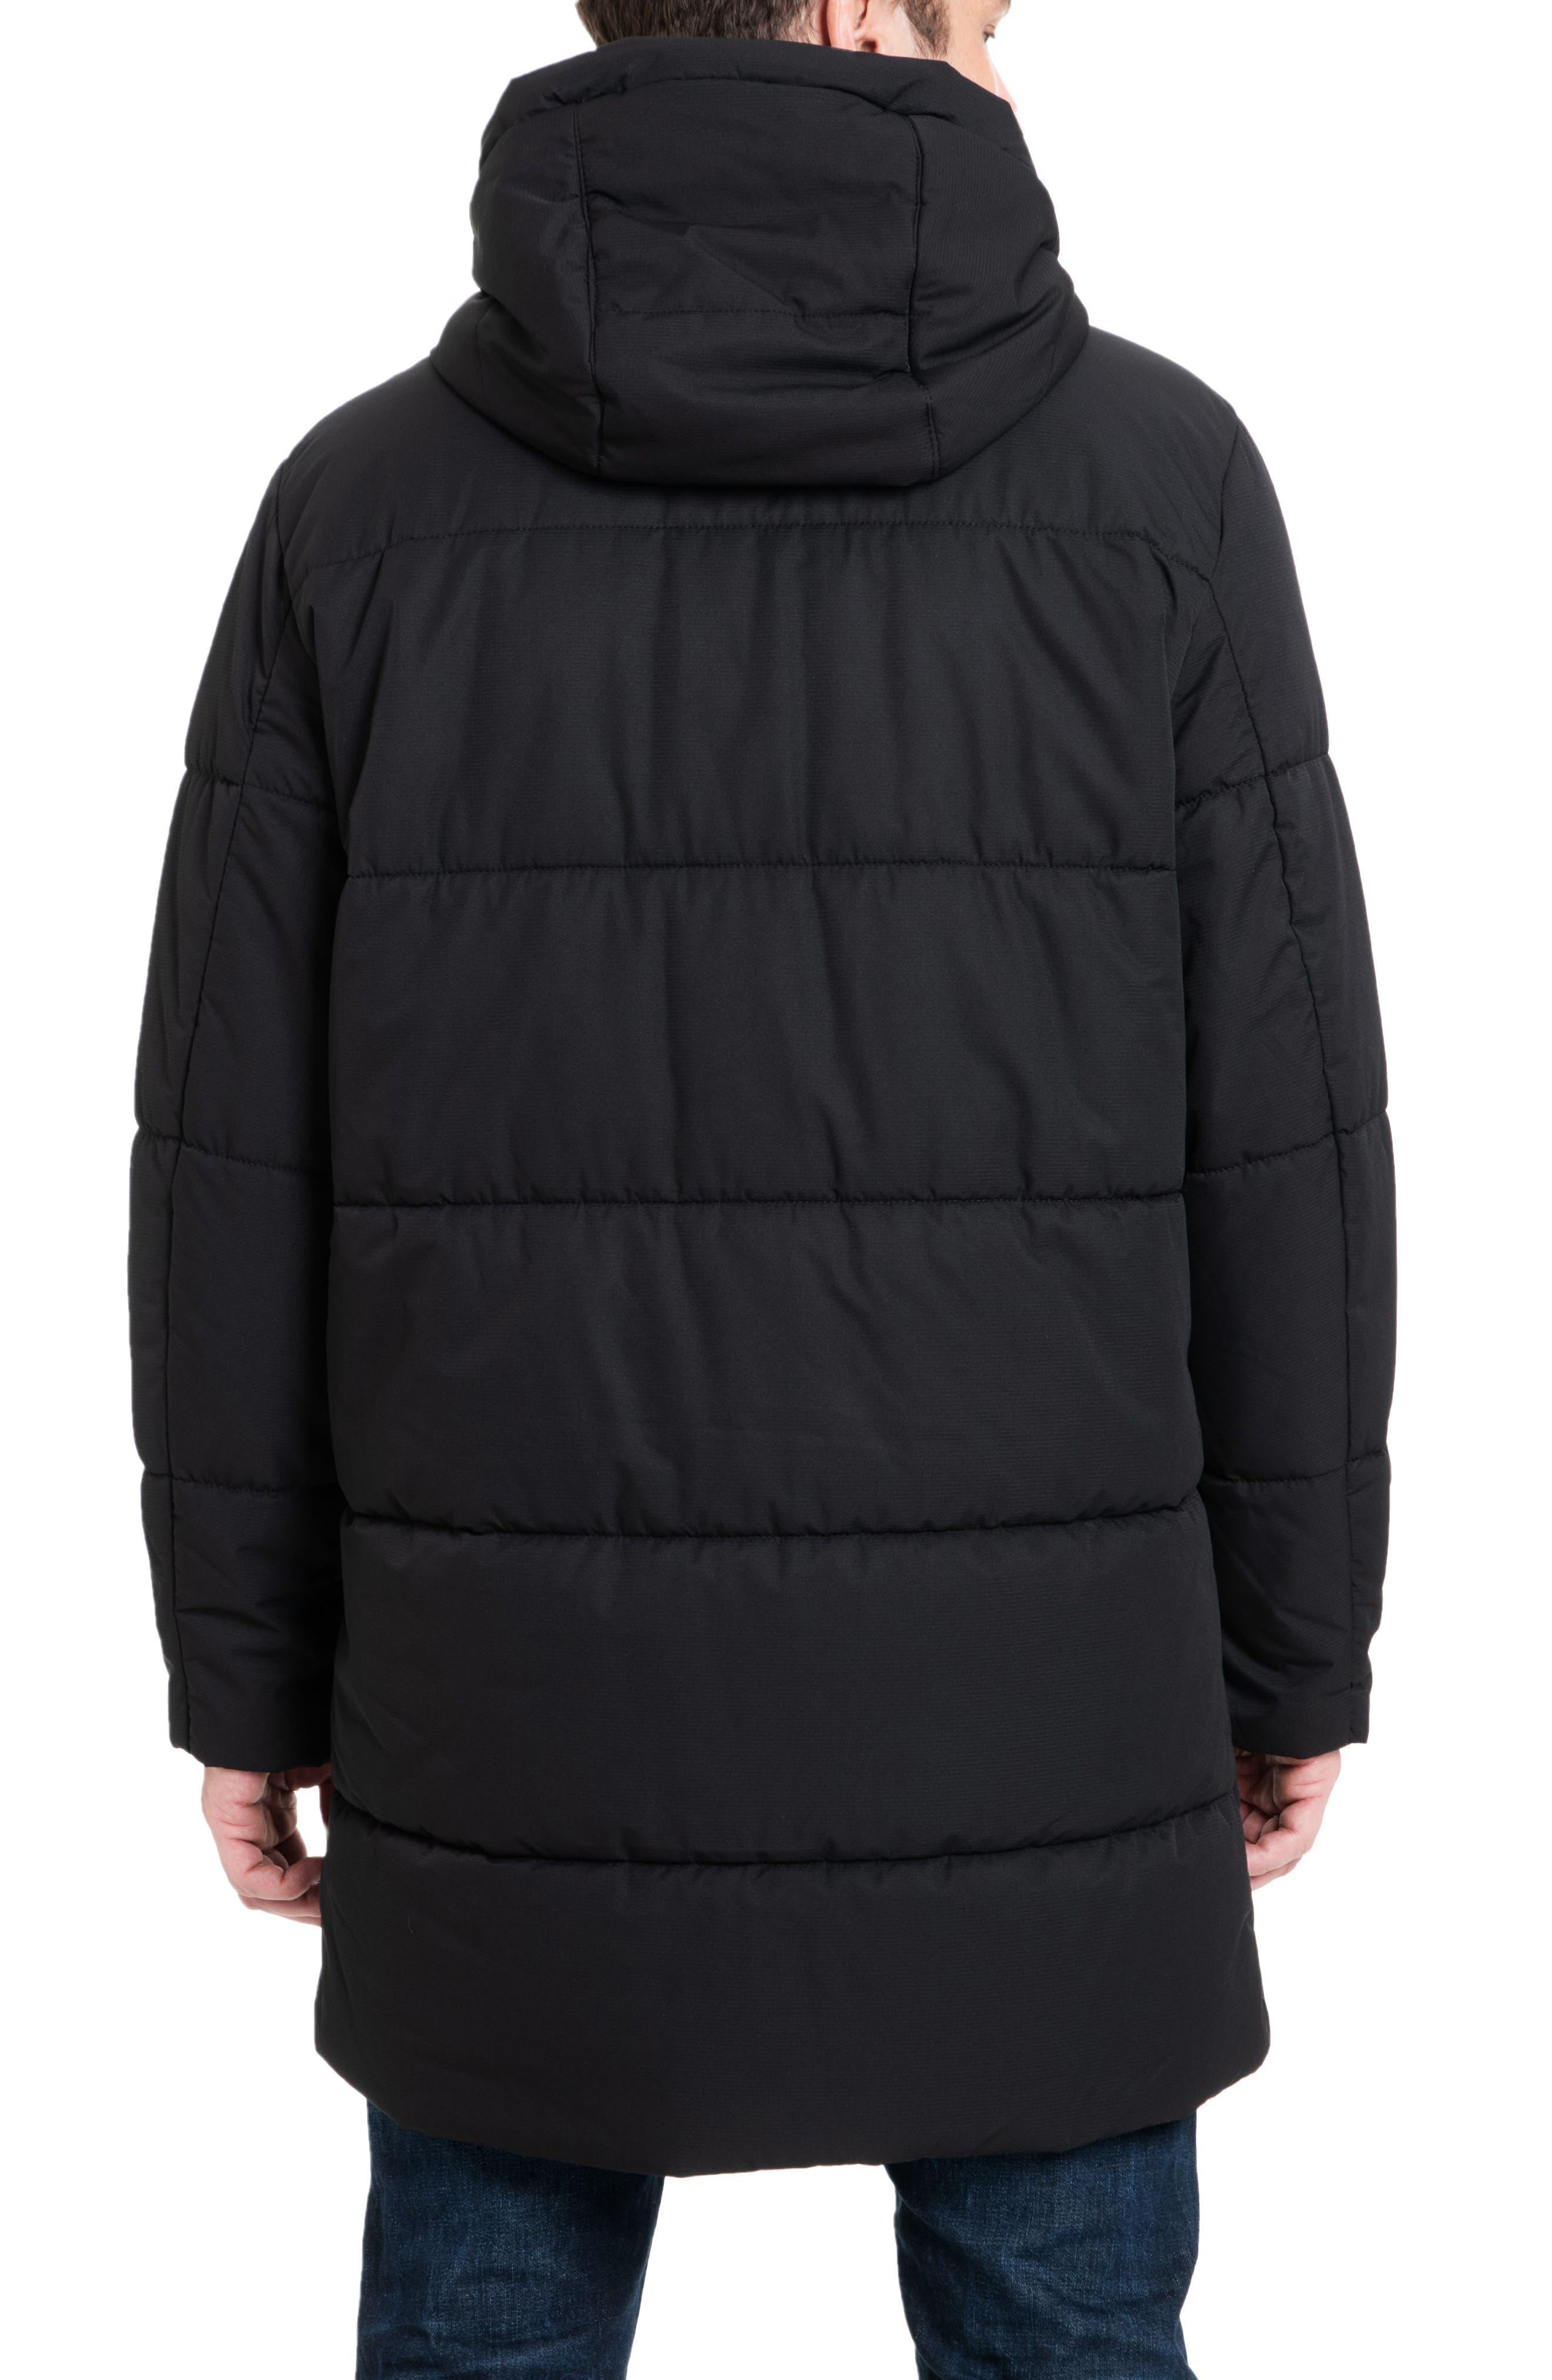 Holland Hooded Coat,                             Alternate thumbnail 2, color,                             BLACK